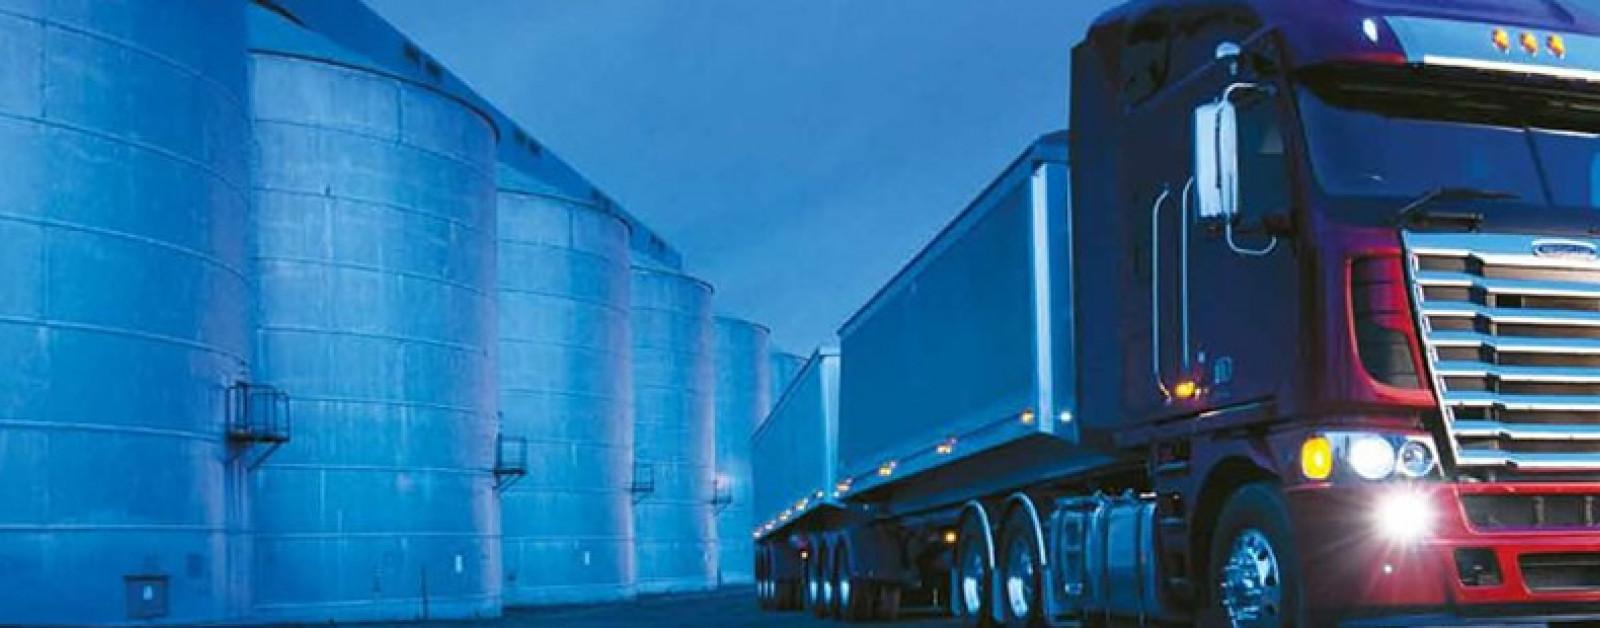 New Freightliner Argosy for sale in Sunshine Coast - Daimler